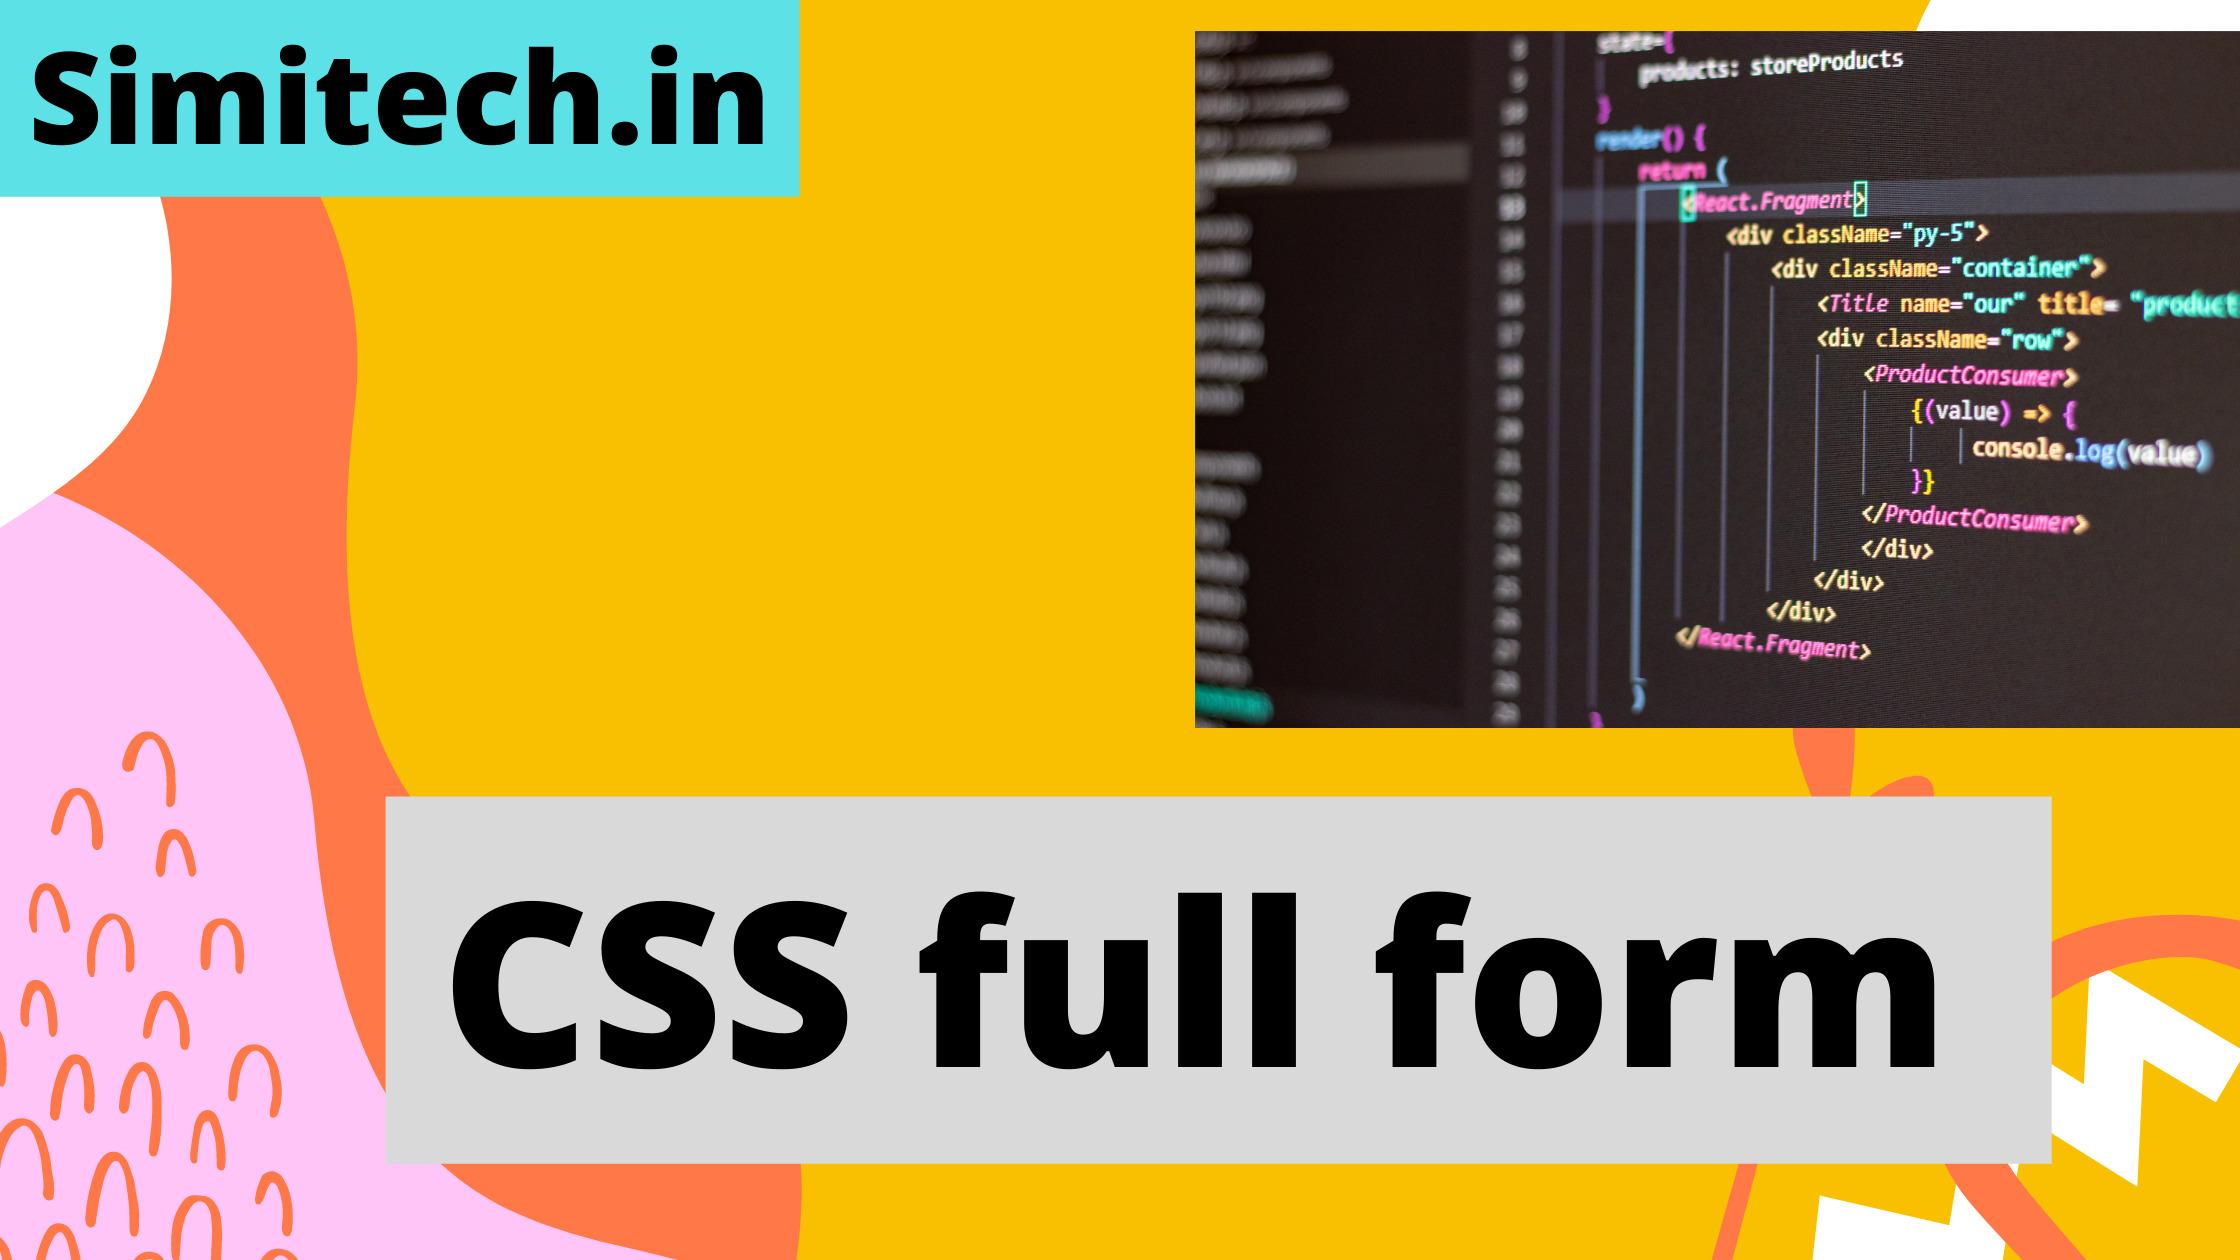 CSS full form